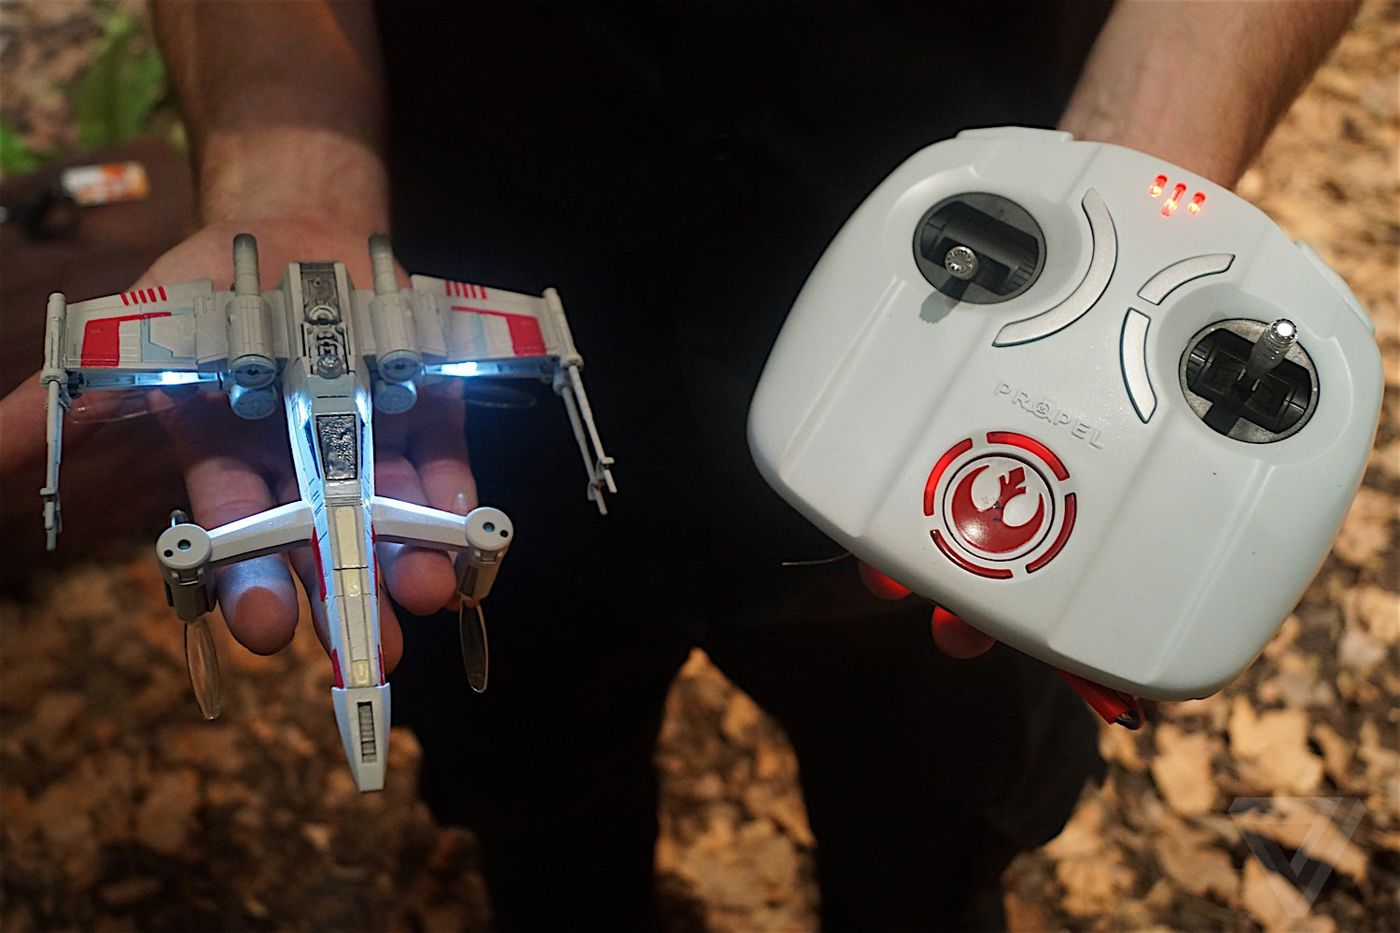 Propel's Star Wars battle quads